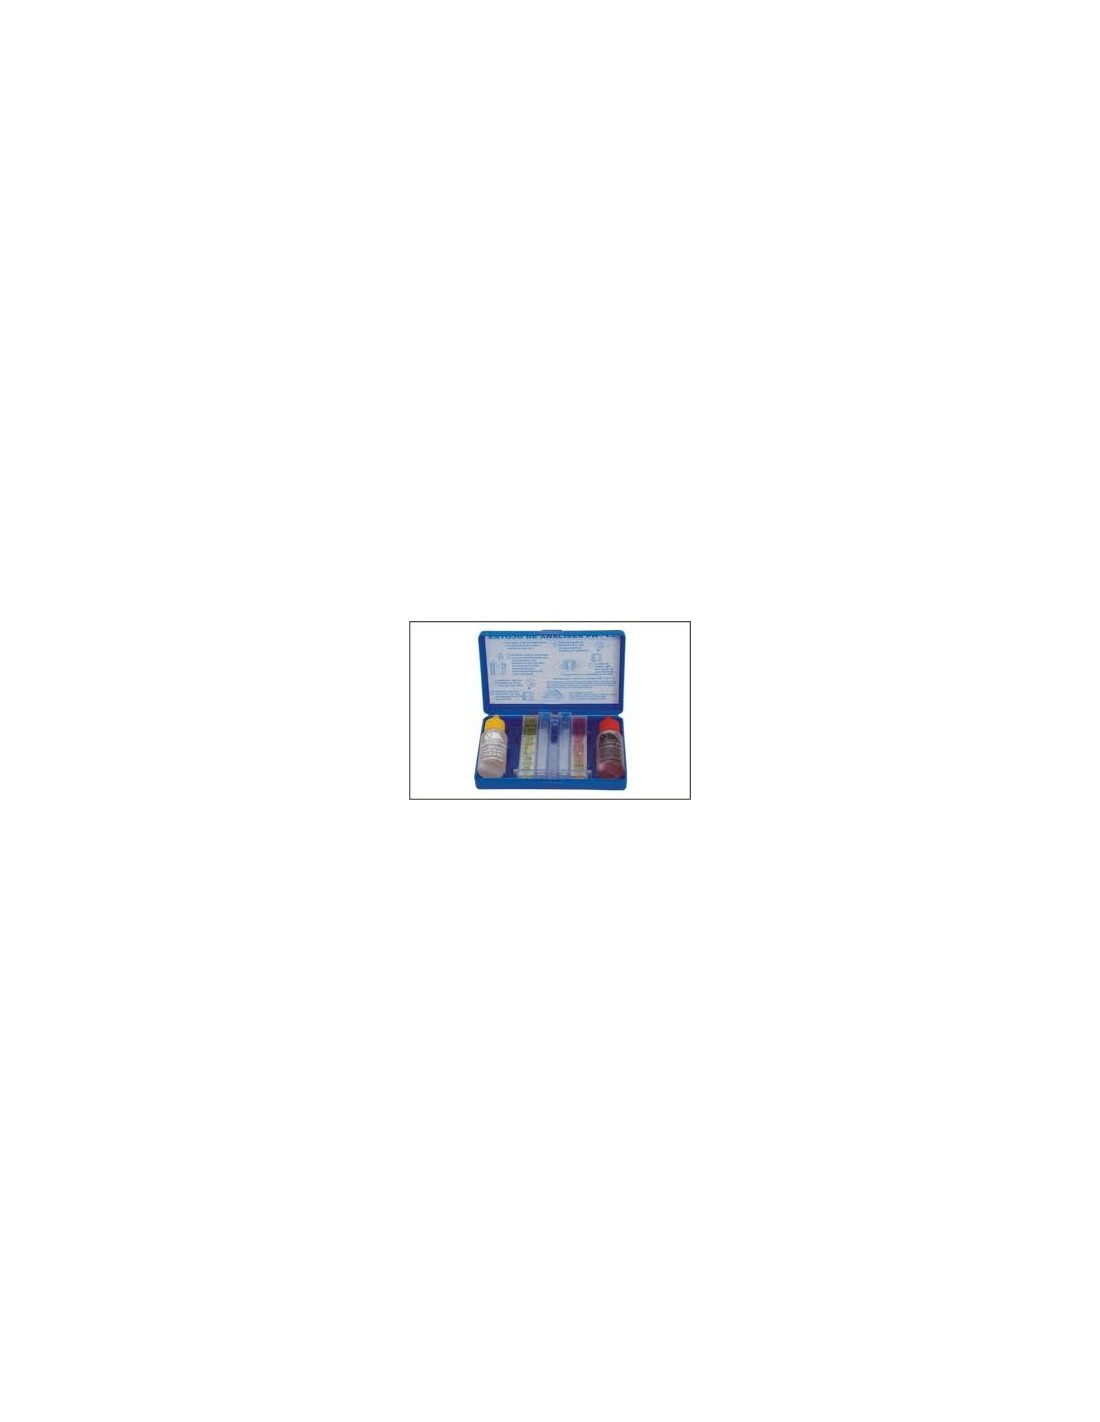 Test kit analizzatore ph e cloro piscine detershoponline - Test ph piscine ...